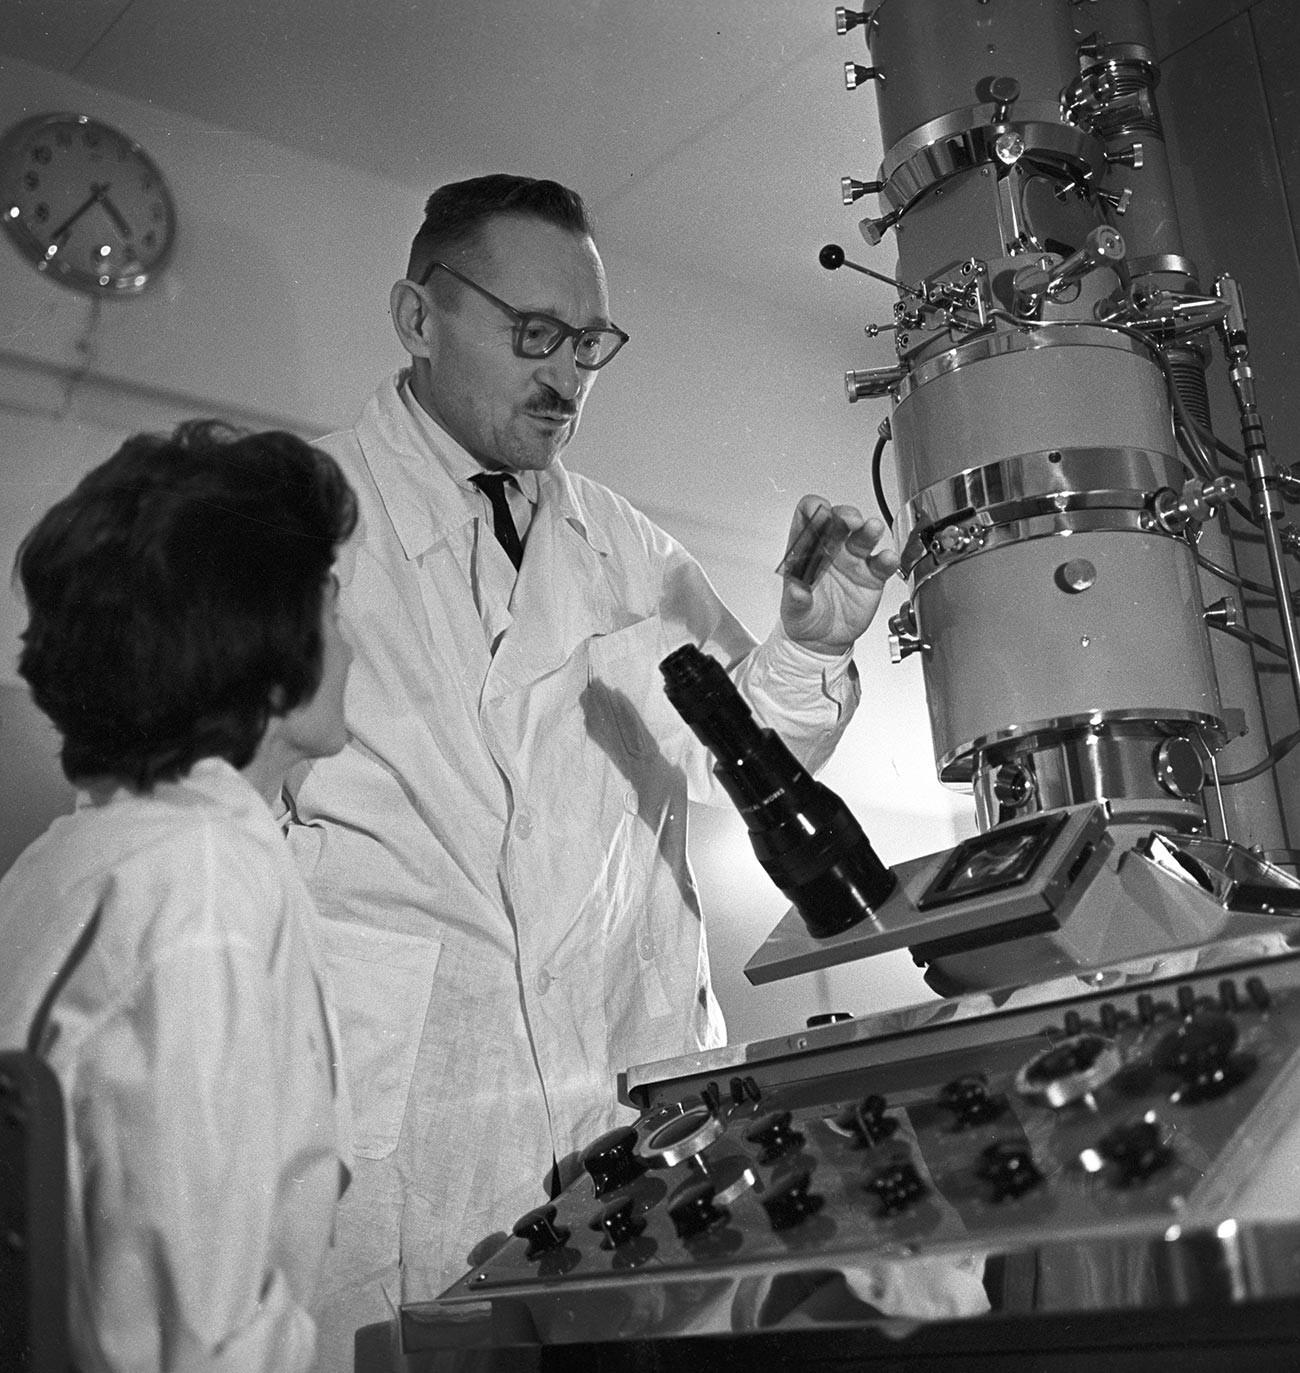 Soviet scientist Viktor M. Zhdanov categorically denied AIDS was artificially created.